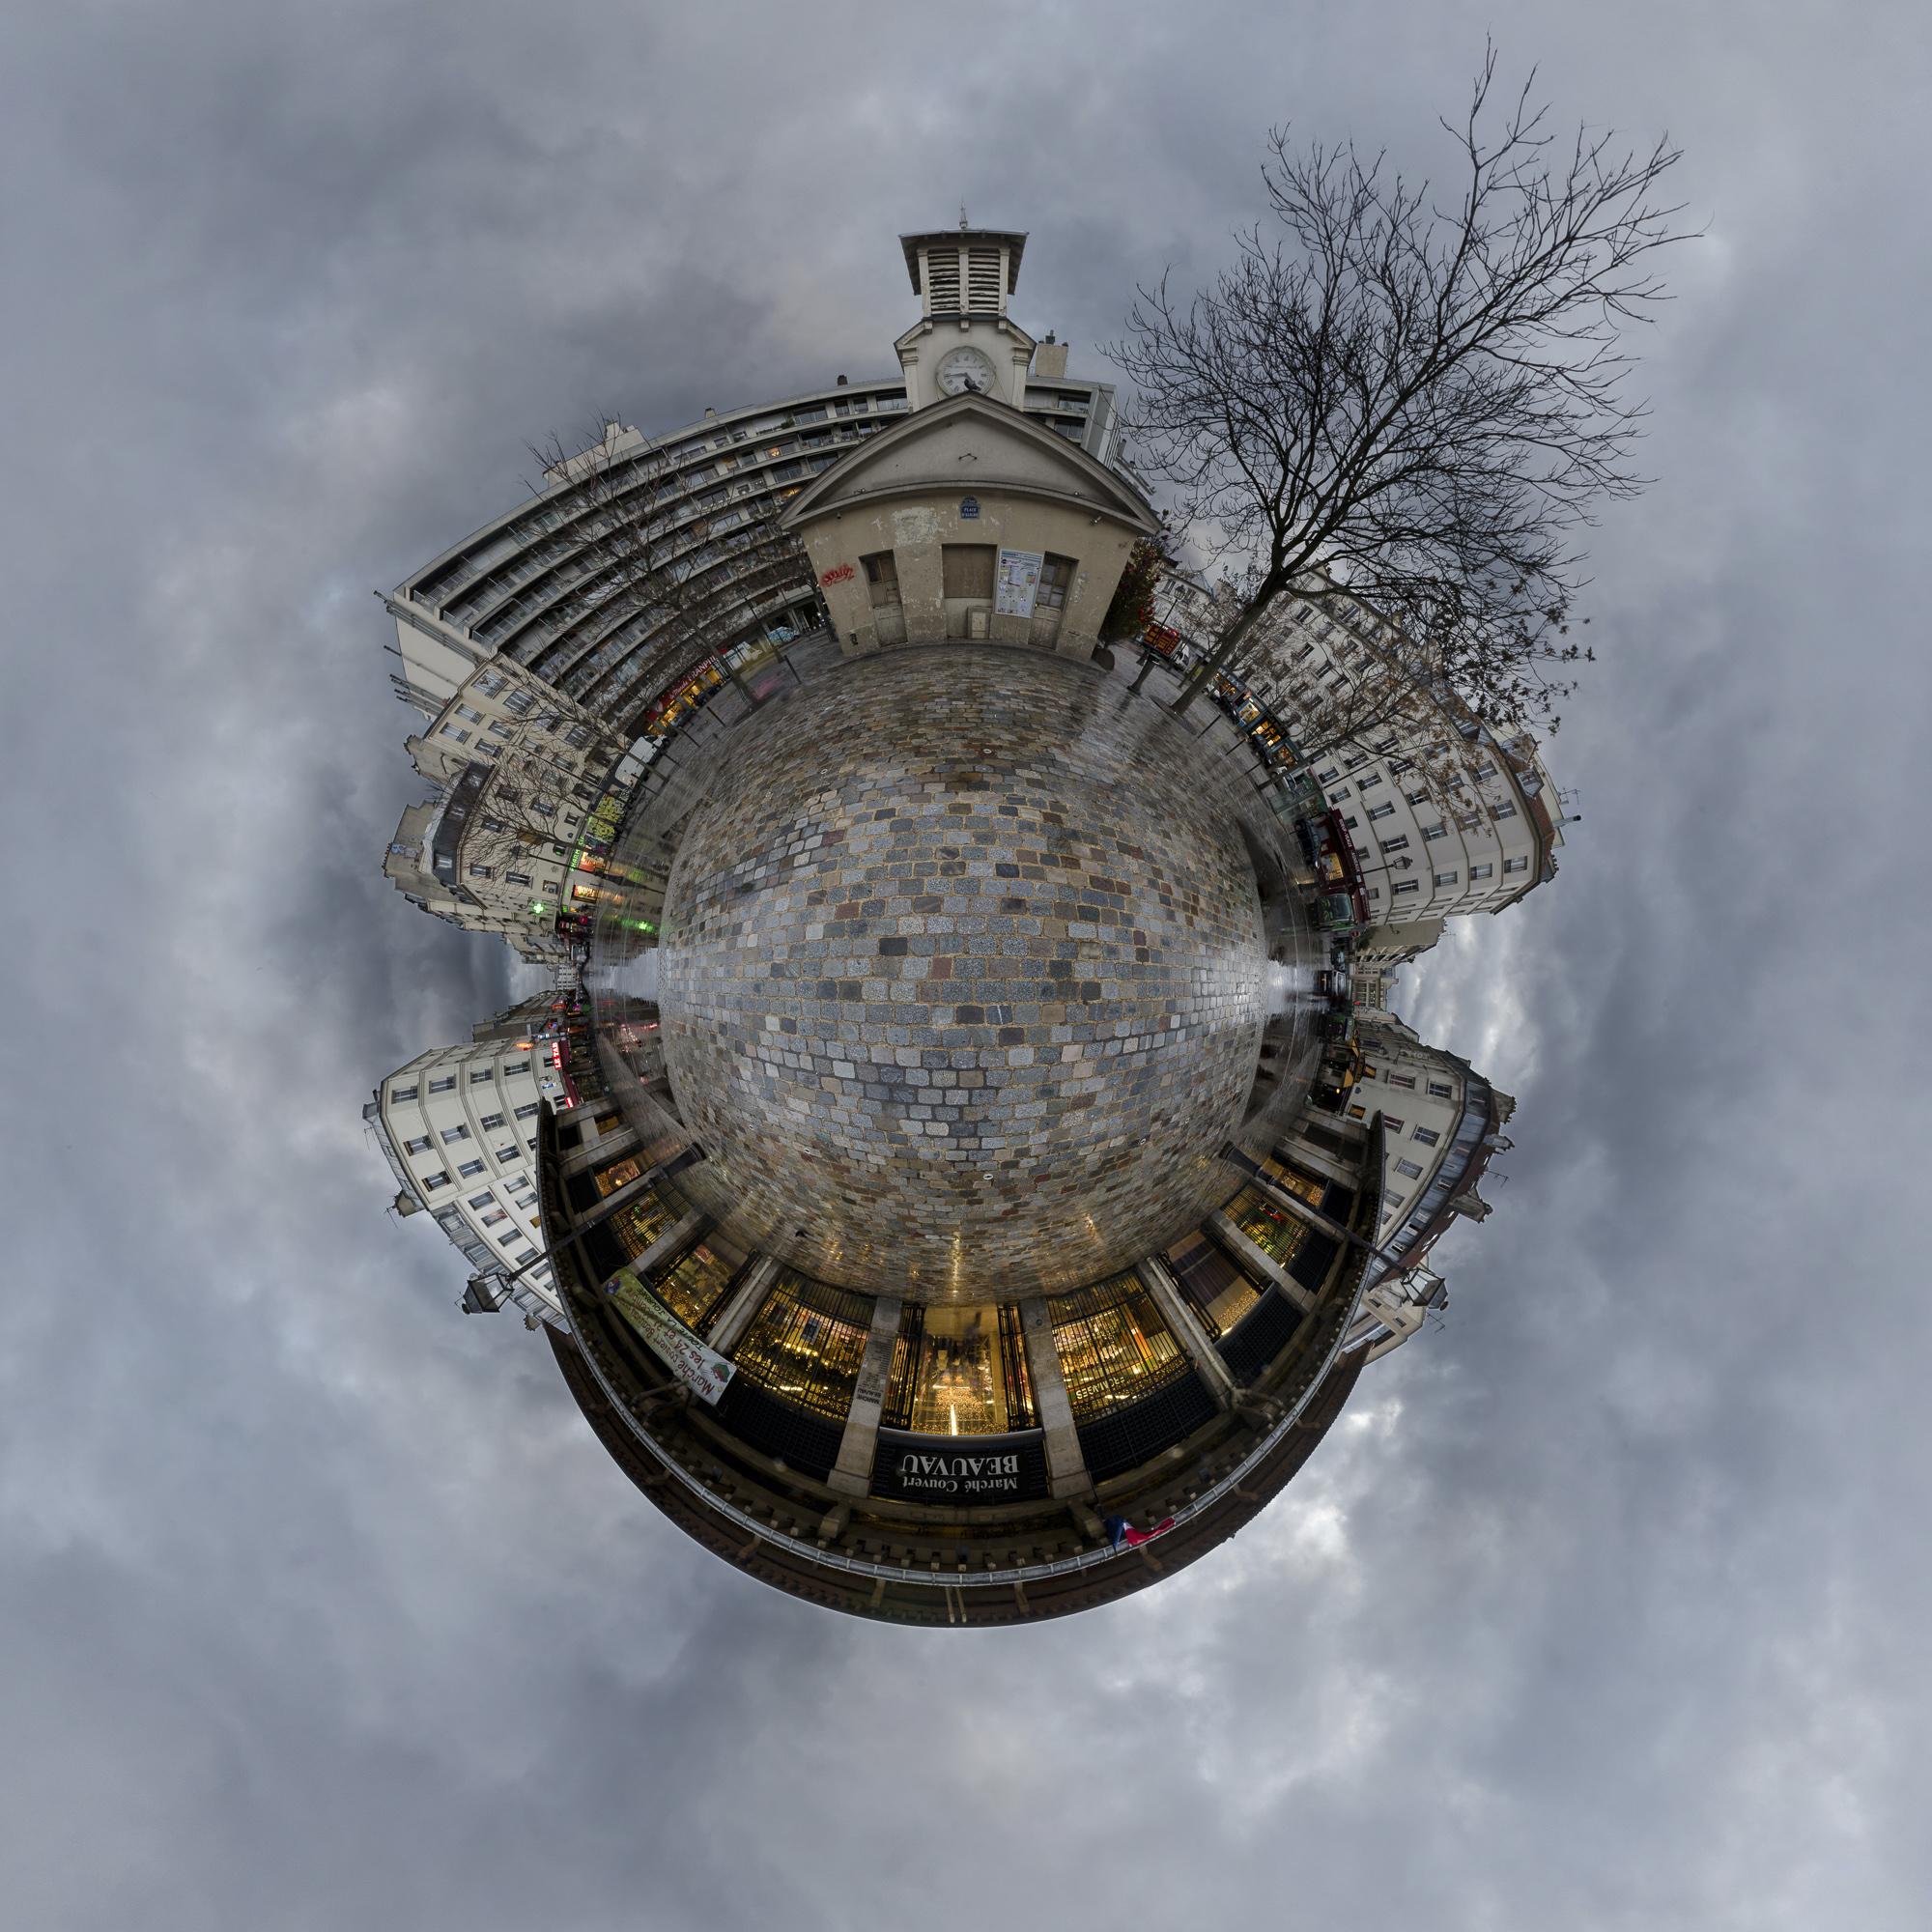 Place d'Aligre  PHOTOGRAPHY: ALEXANDER J.E. BRADLEY • NIKON D7000